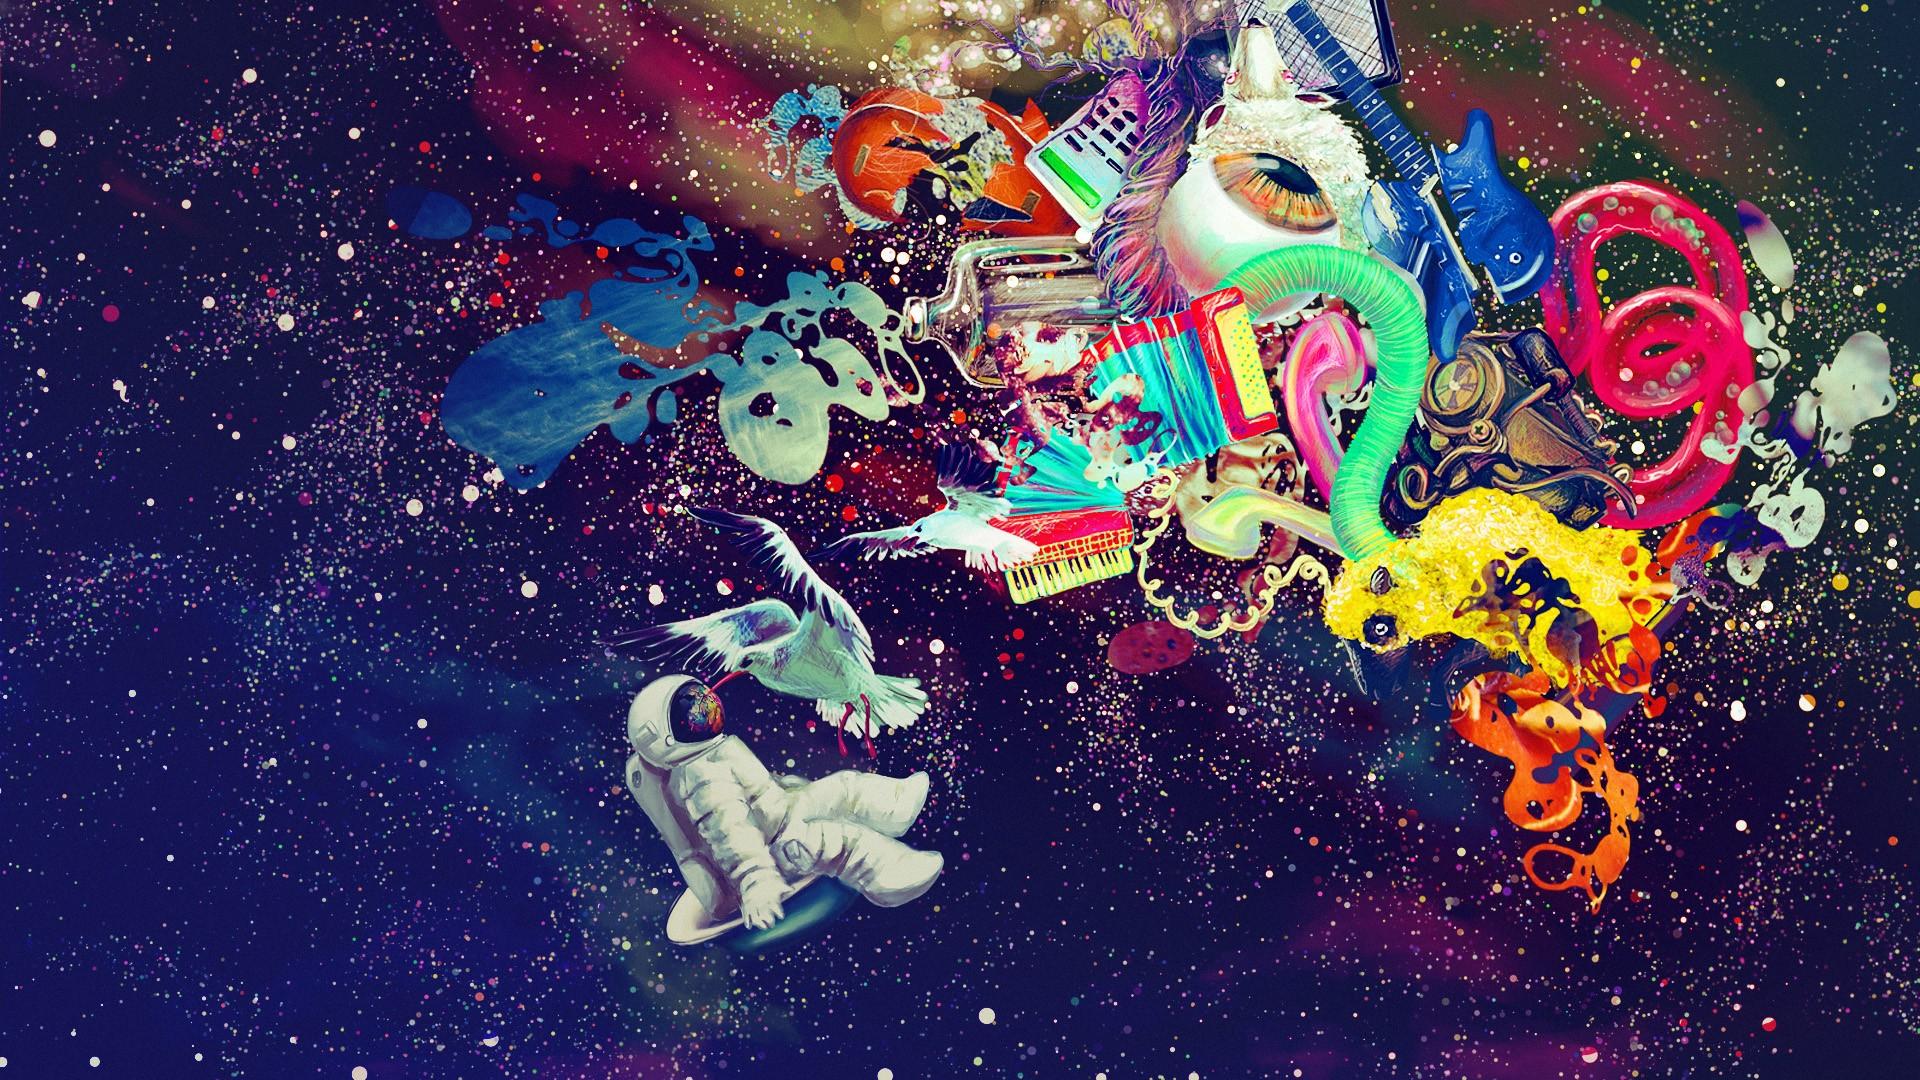 Trippy Wallpaper Astronaut